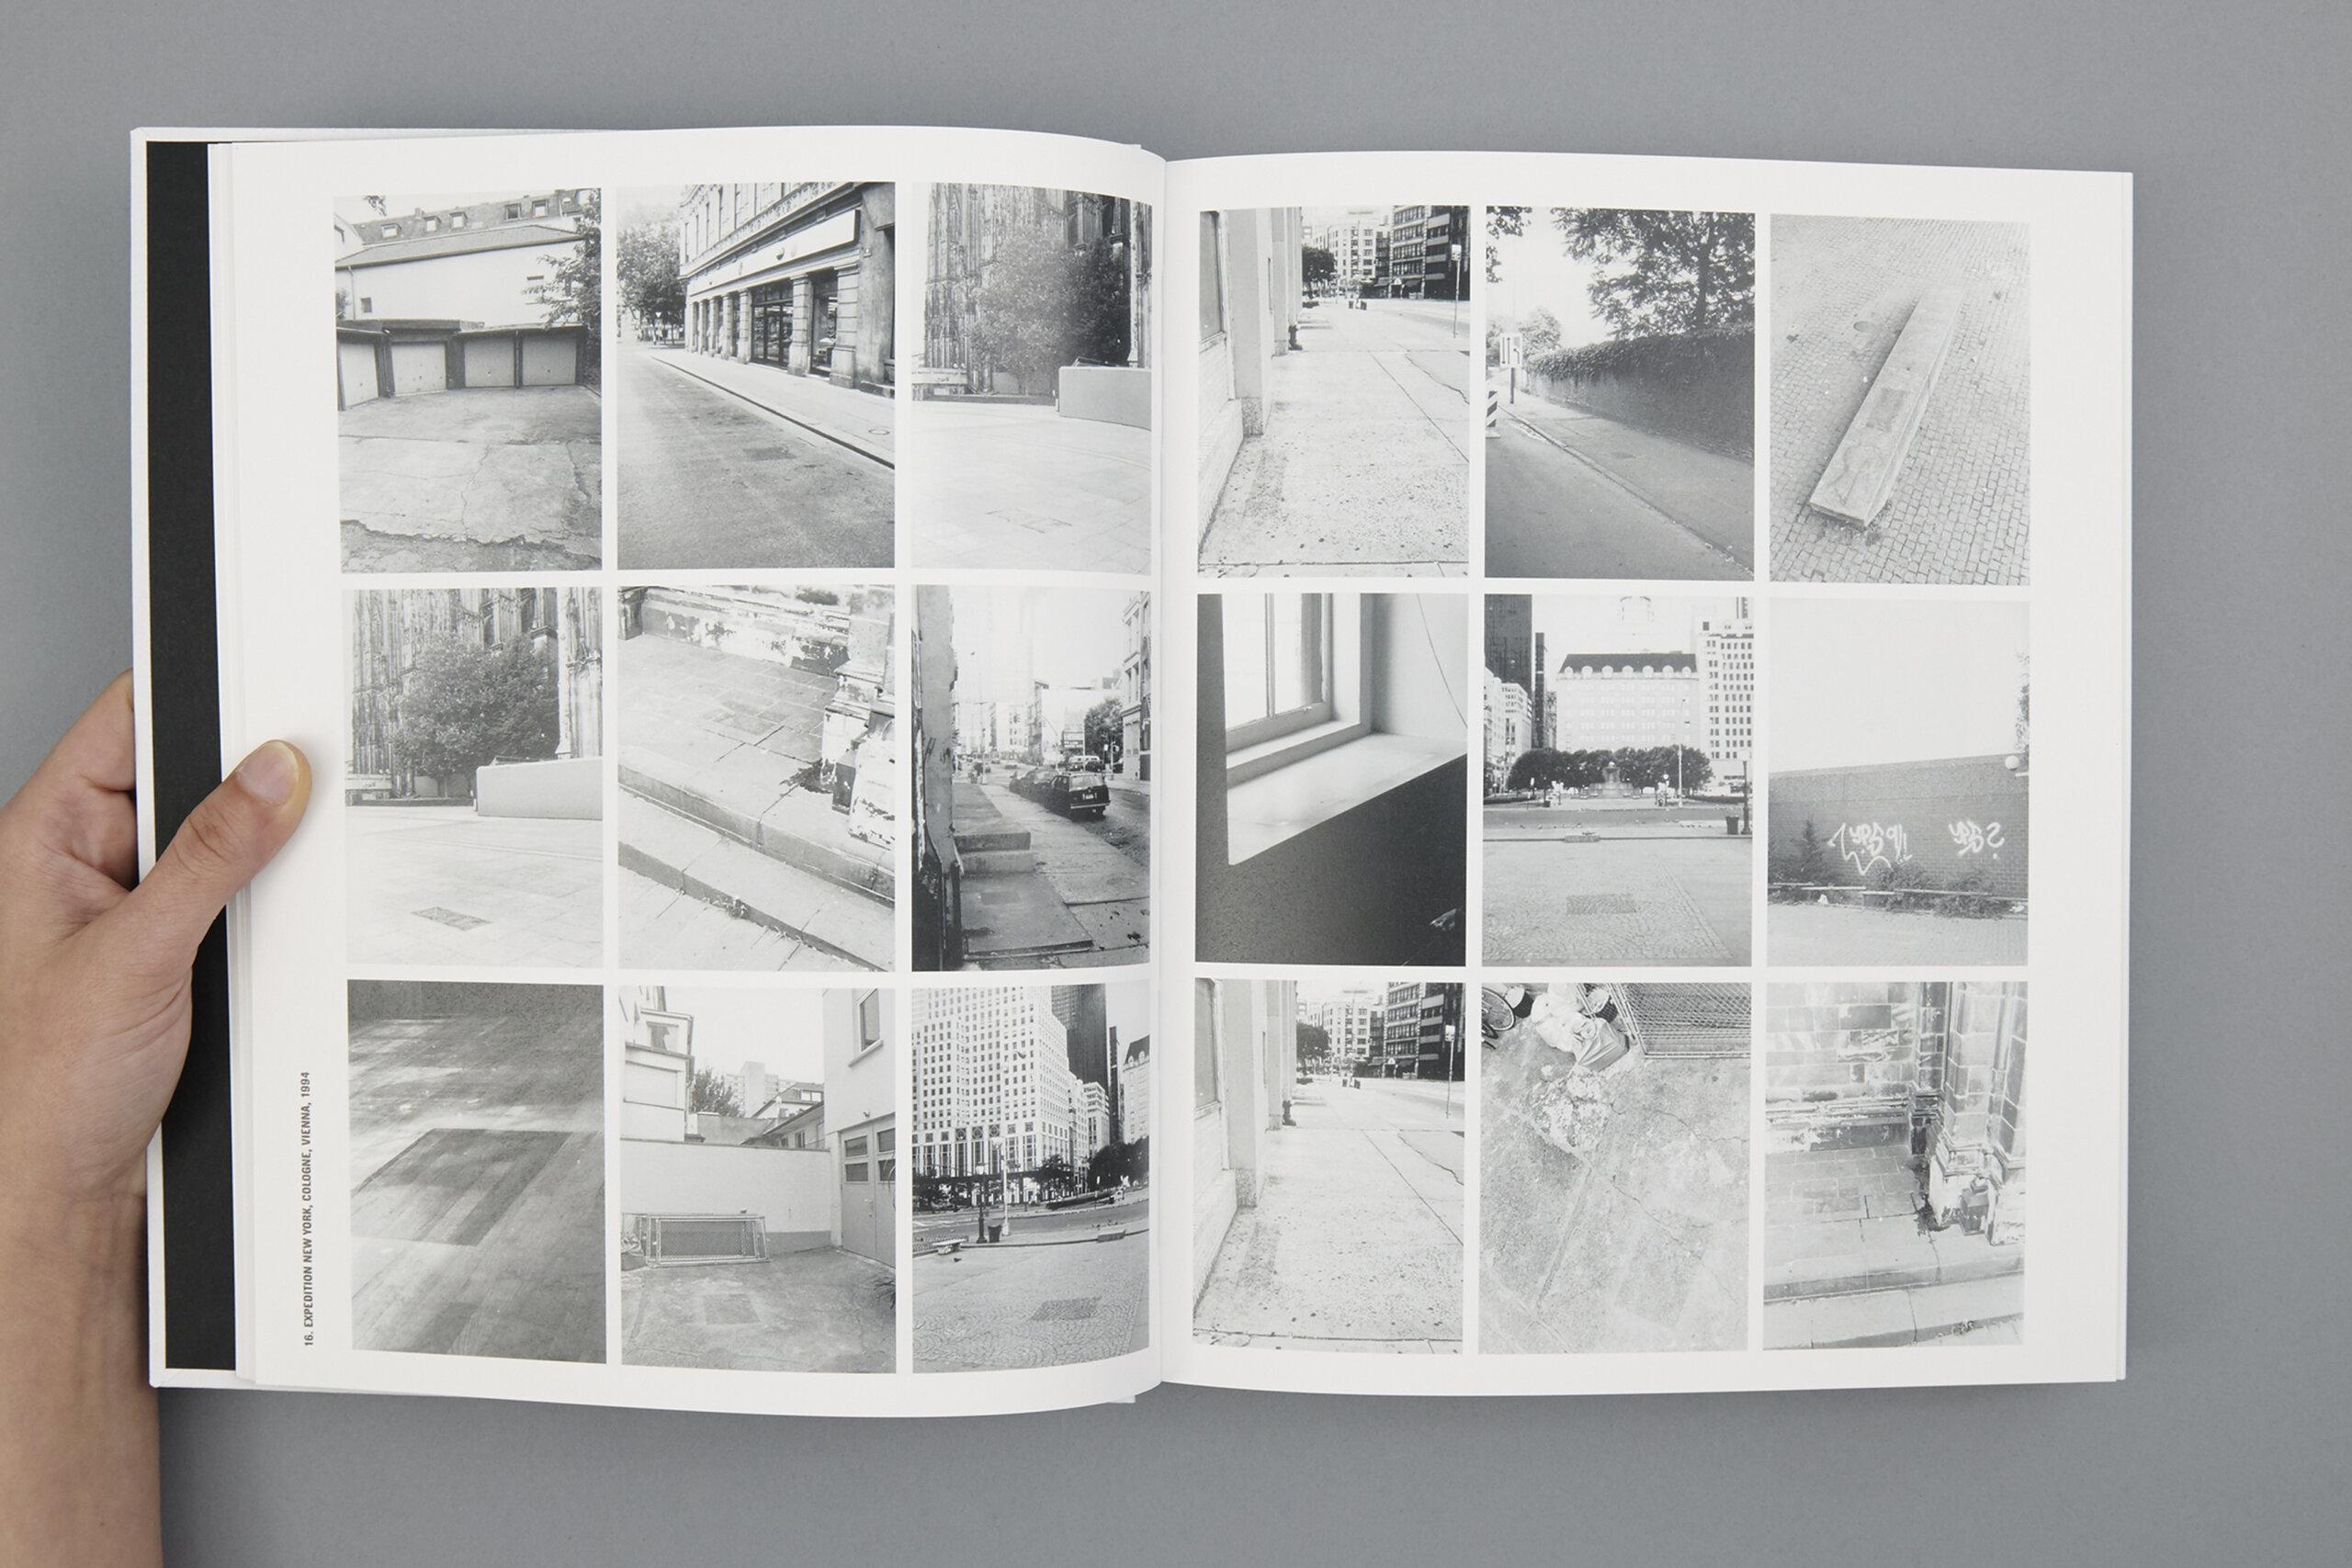 wurm-photographs-delpire-co-2